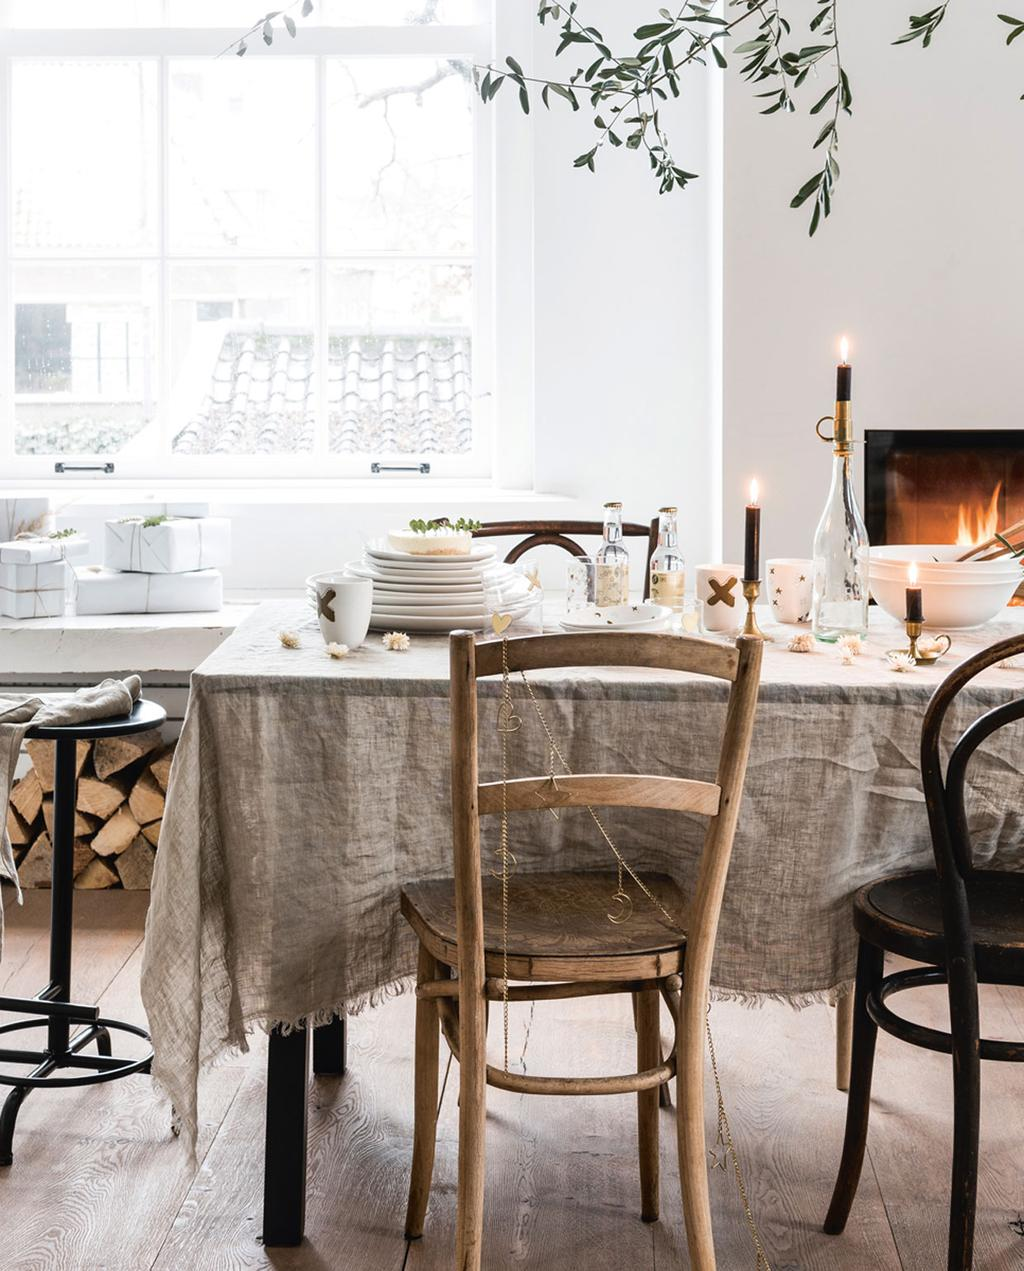 vtwonen feestkalender 2019 | vtwonen kerstservies op tafel